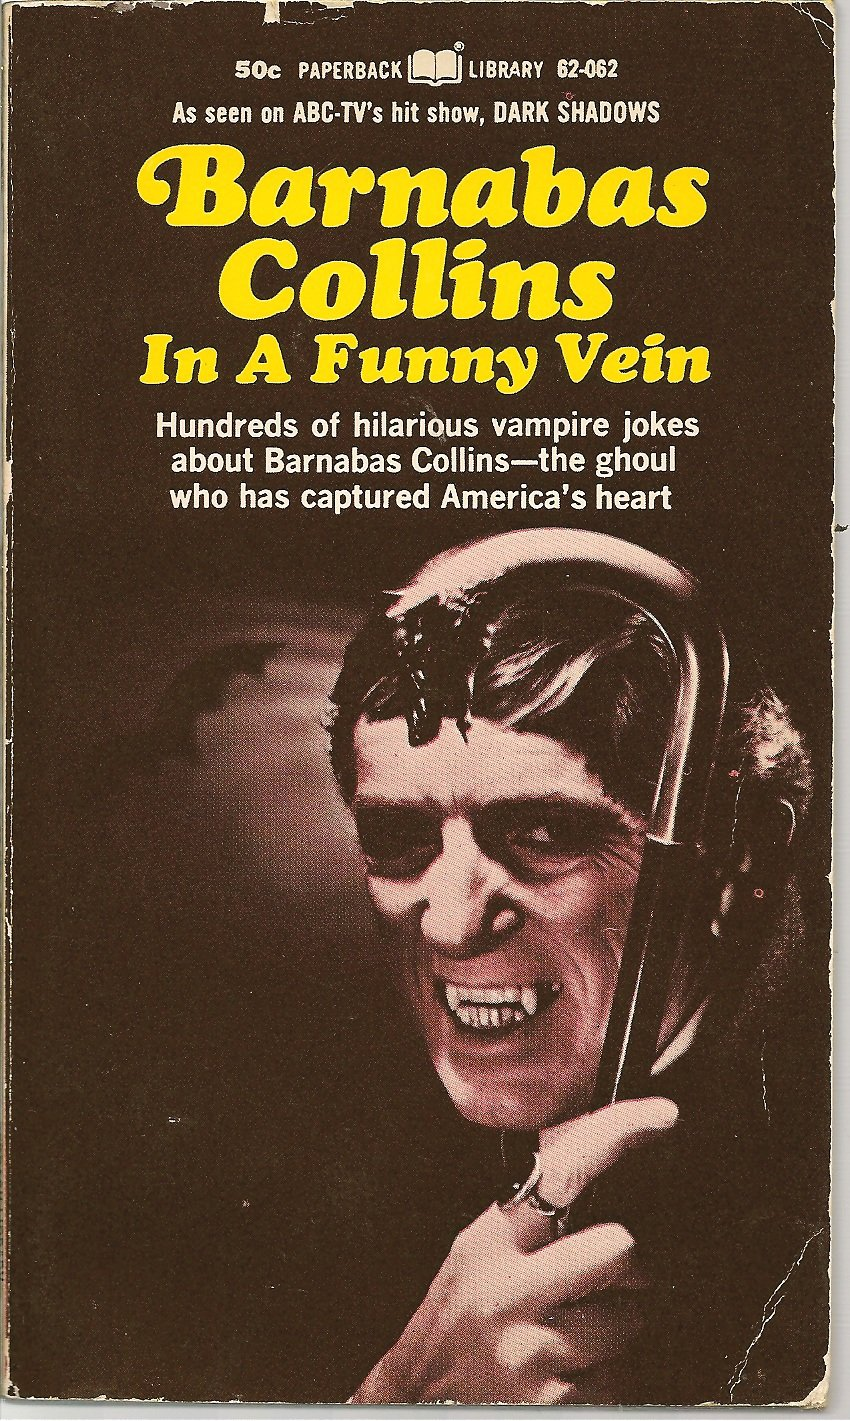 Barnabas Collins in a Funny Vein, Curtis, Dan